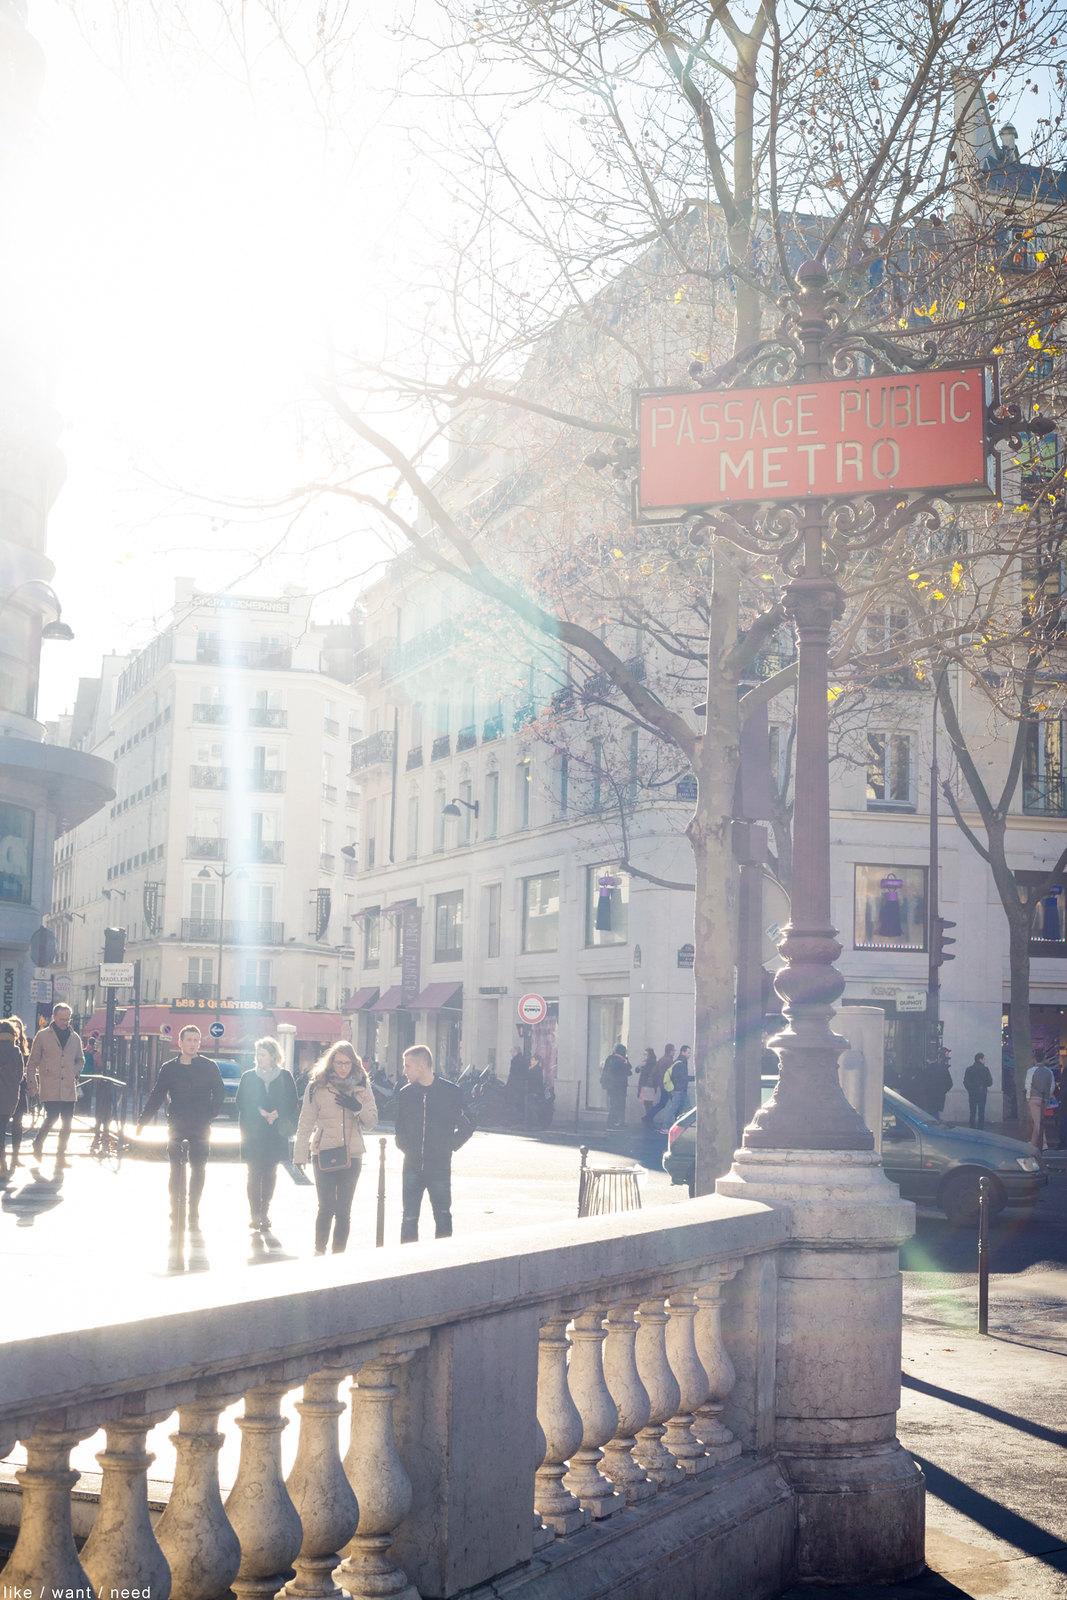 Metro, Place de la Madeleine